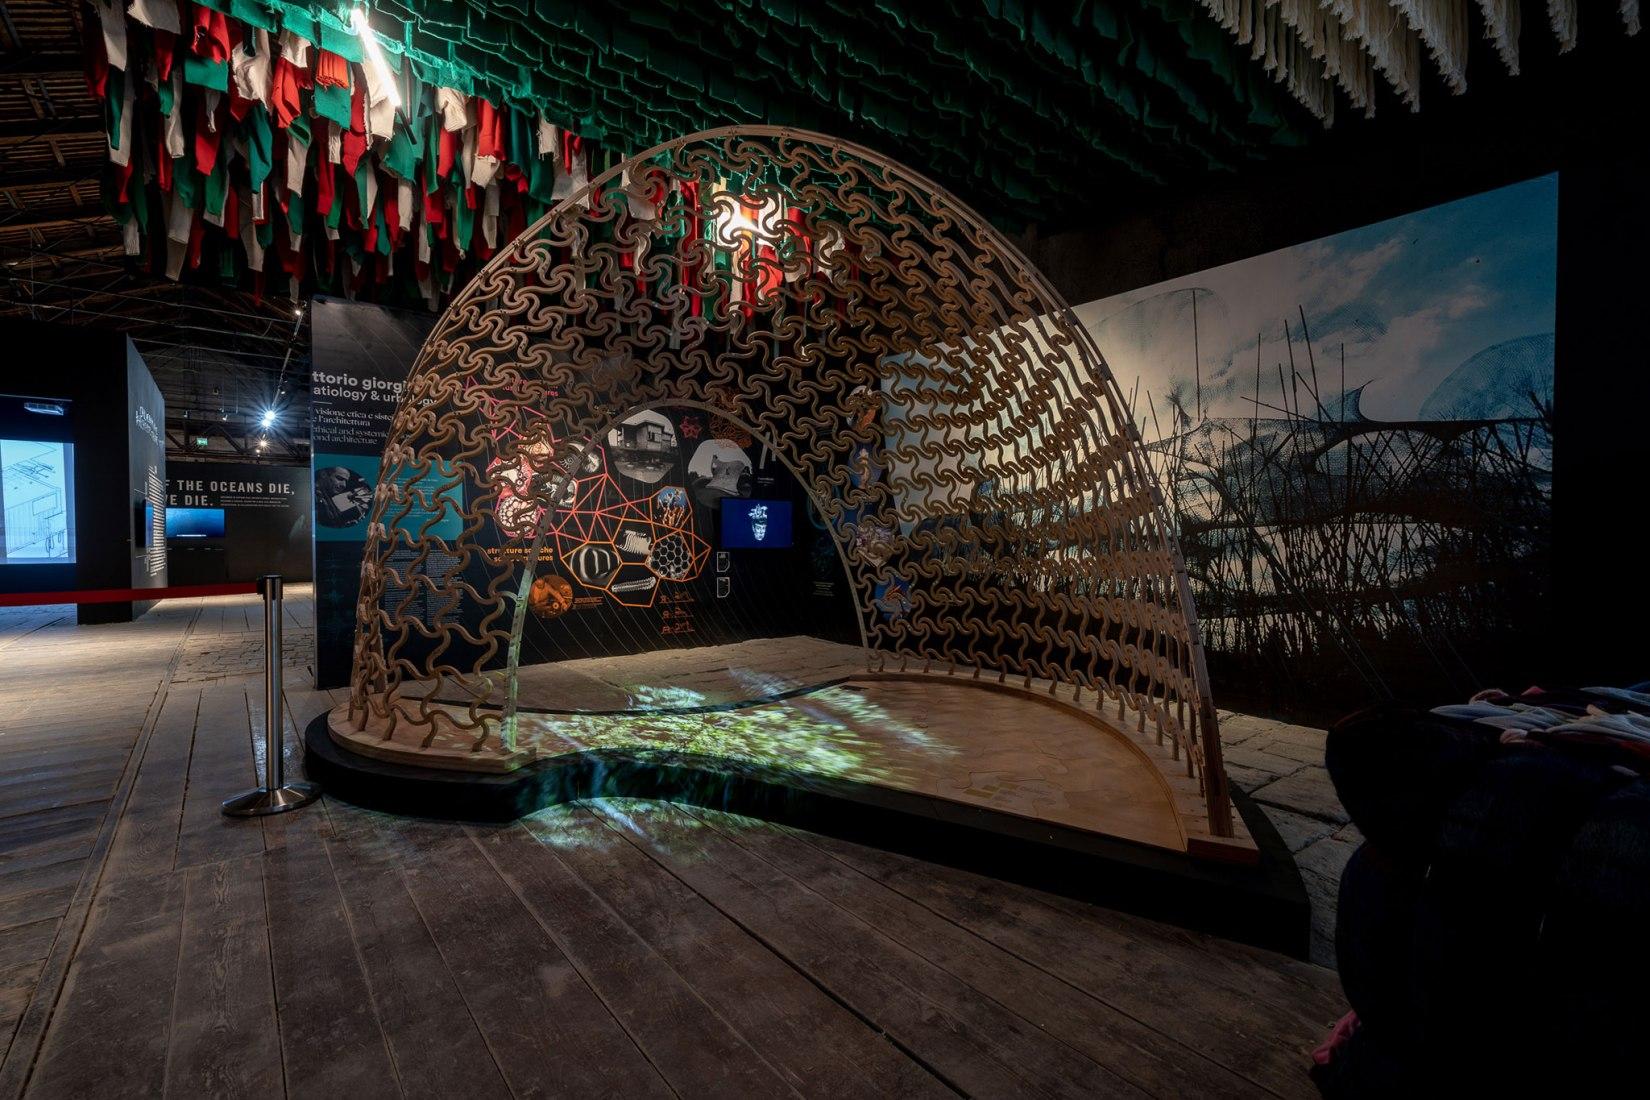 Resilient Communities, Italian Pavilion at the Biennale di Venezia by Alessandro Melis. Photograph by Andrea Avezzù.